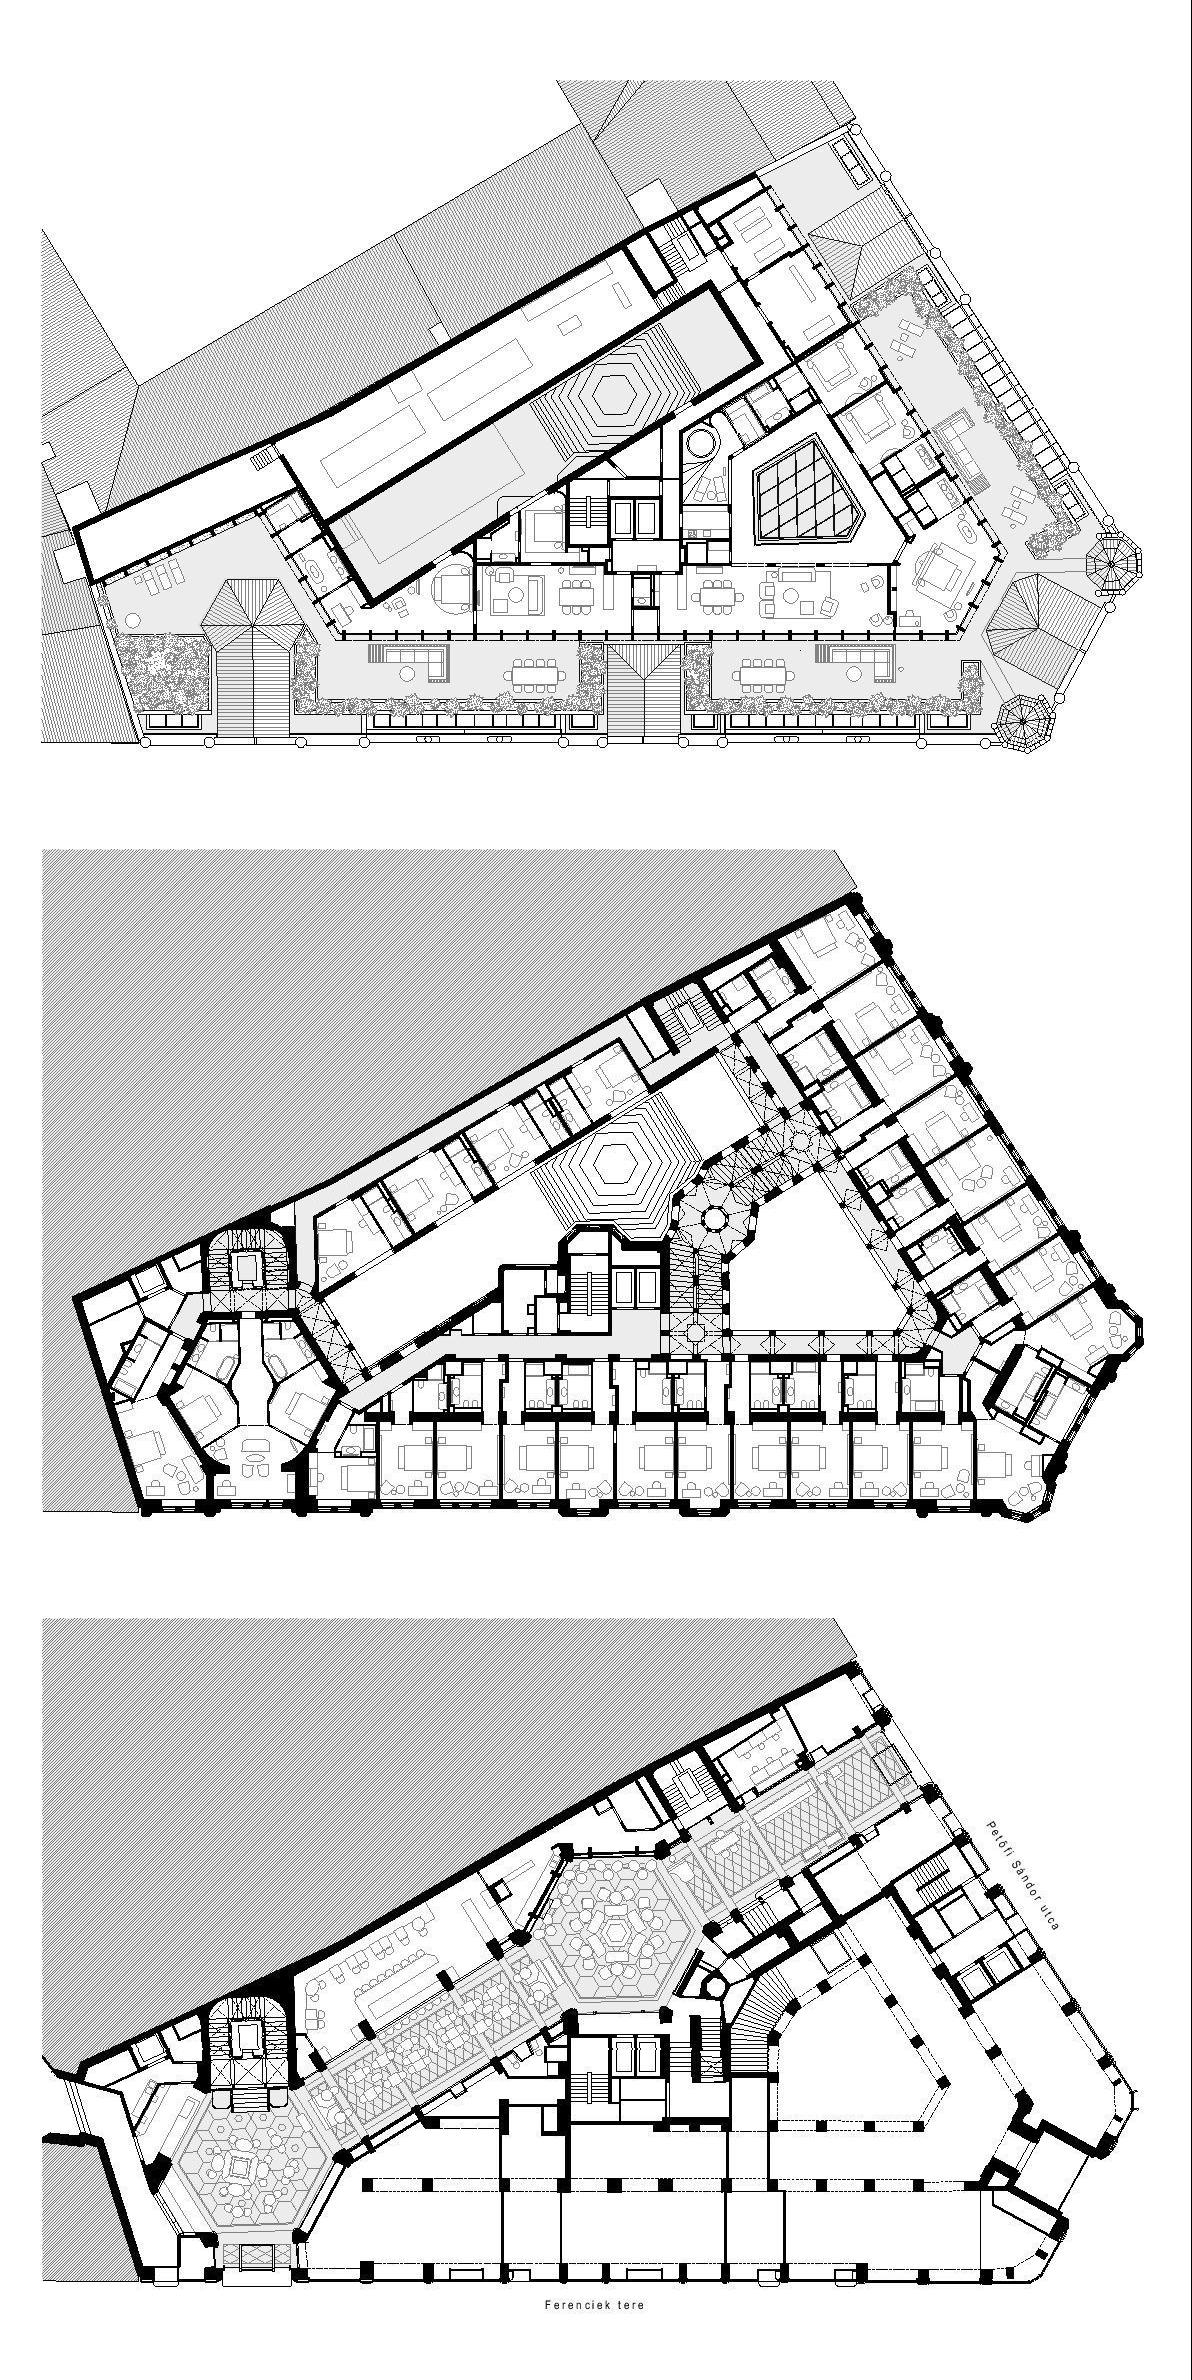 Paris Court Archikon Archello Hotel Floor Plan Hotel Plan Hotel Floor